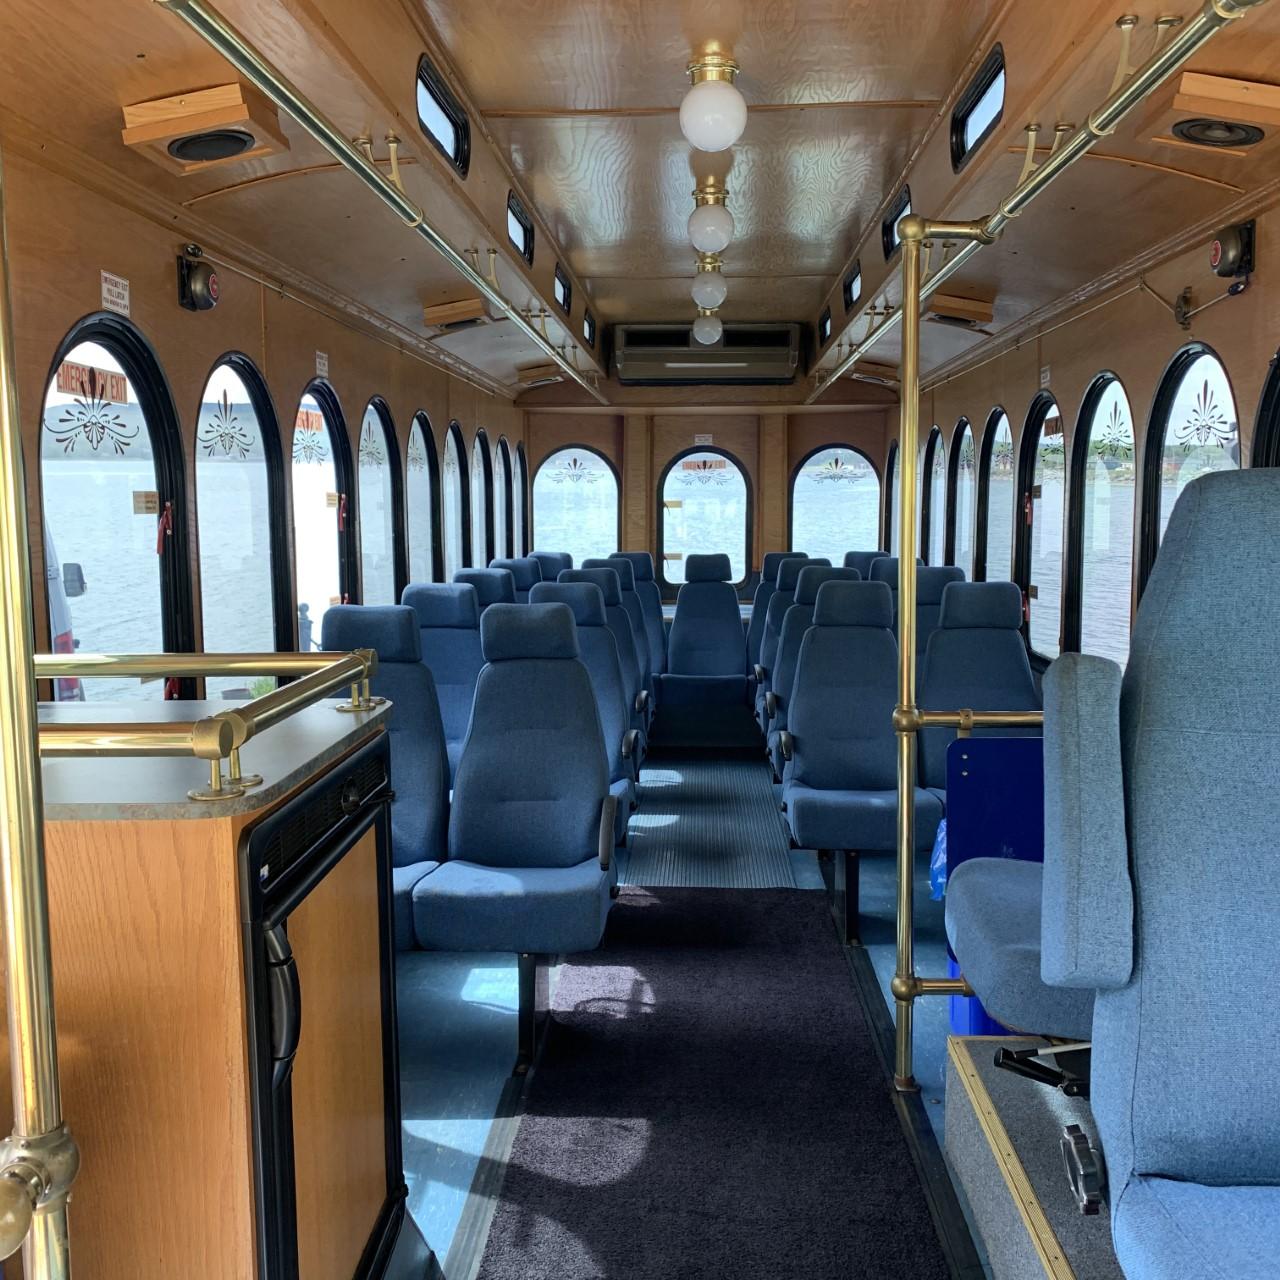 SanFrancisco Trolley, St. Johns luxury bus tour, Best Newfoundland transportation